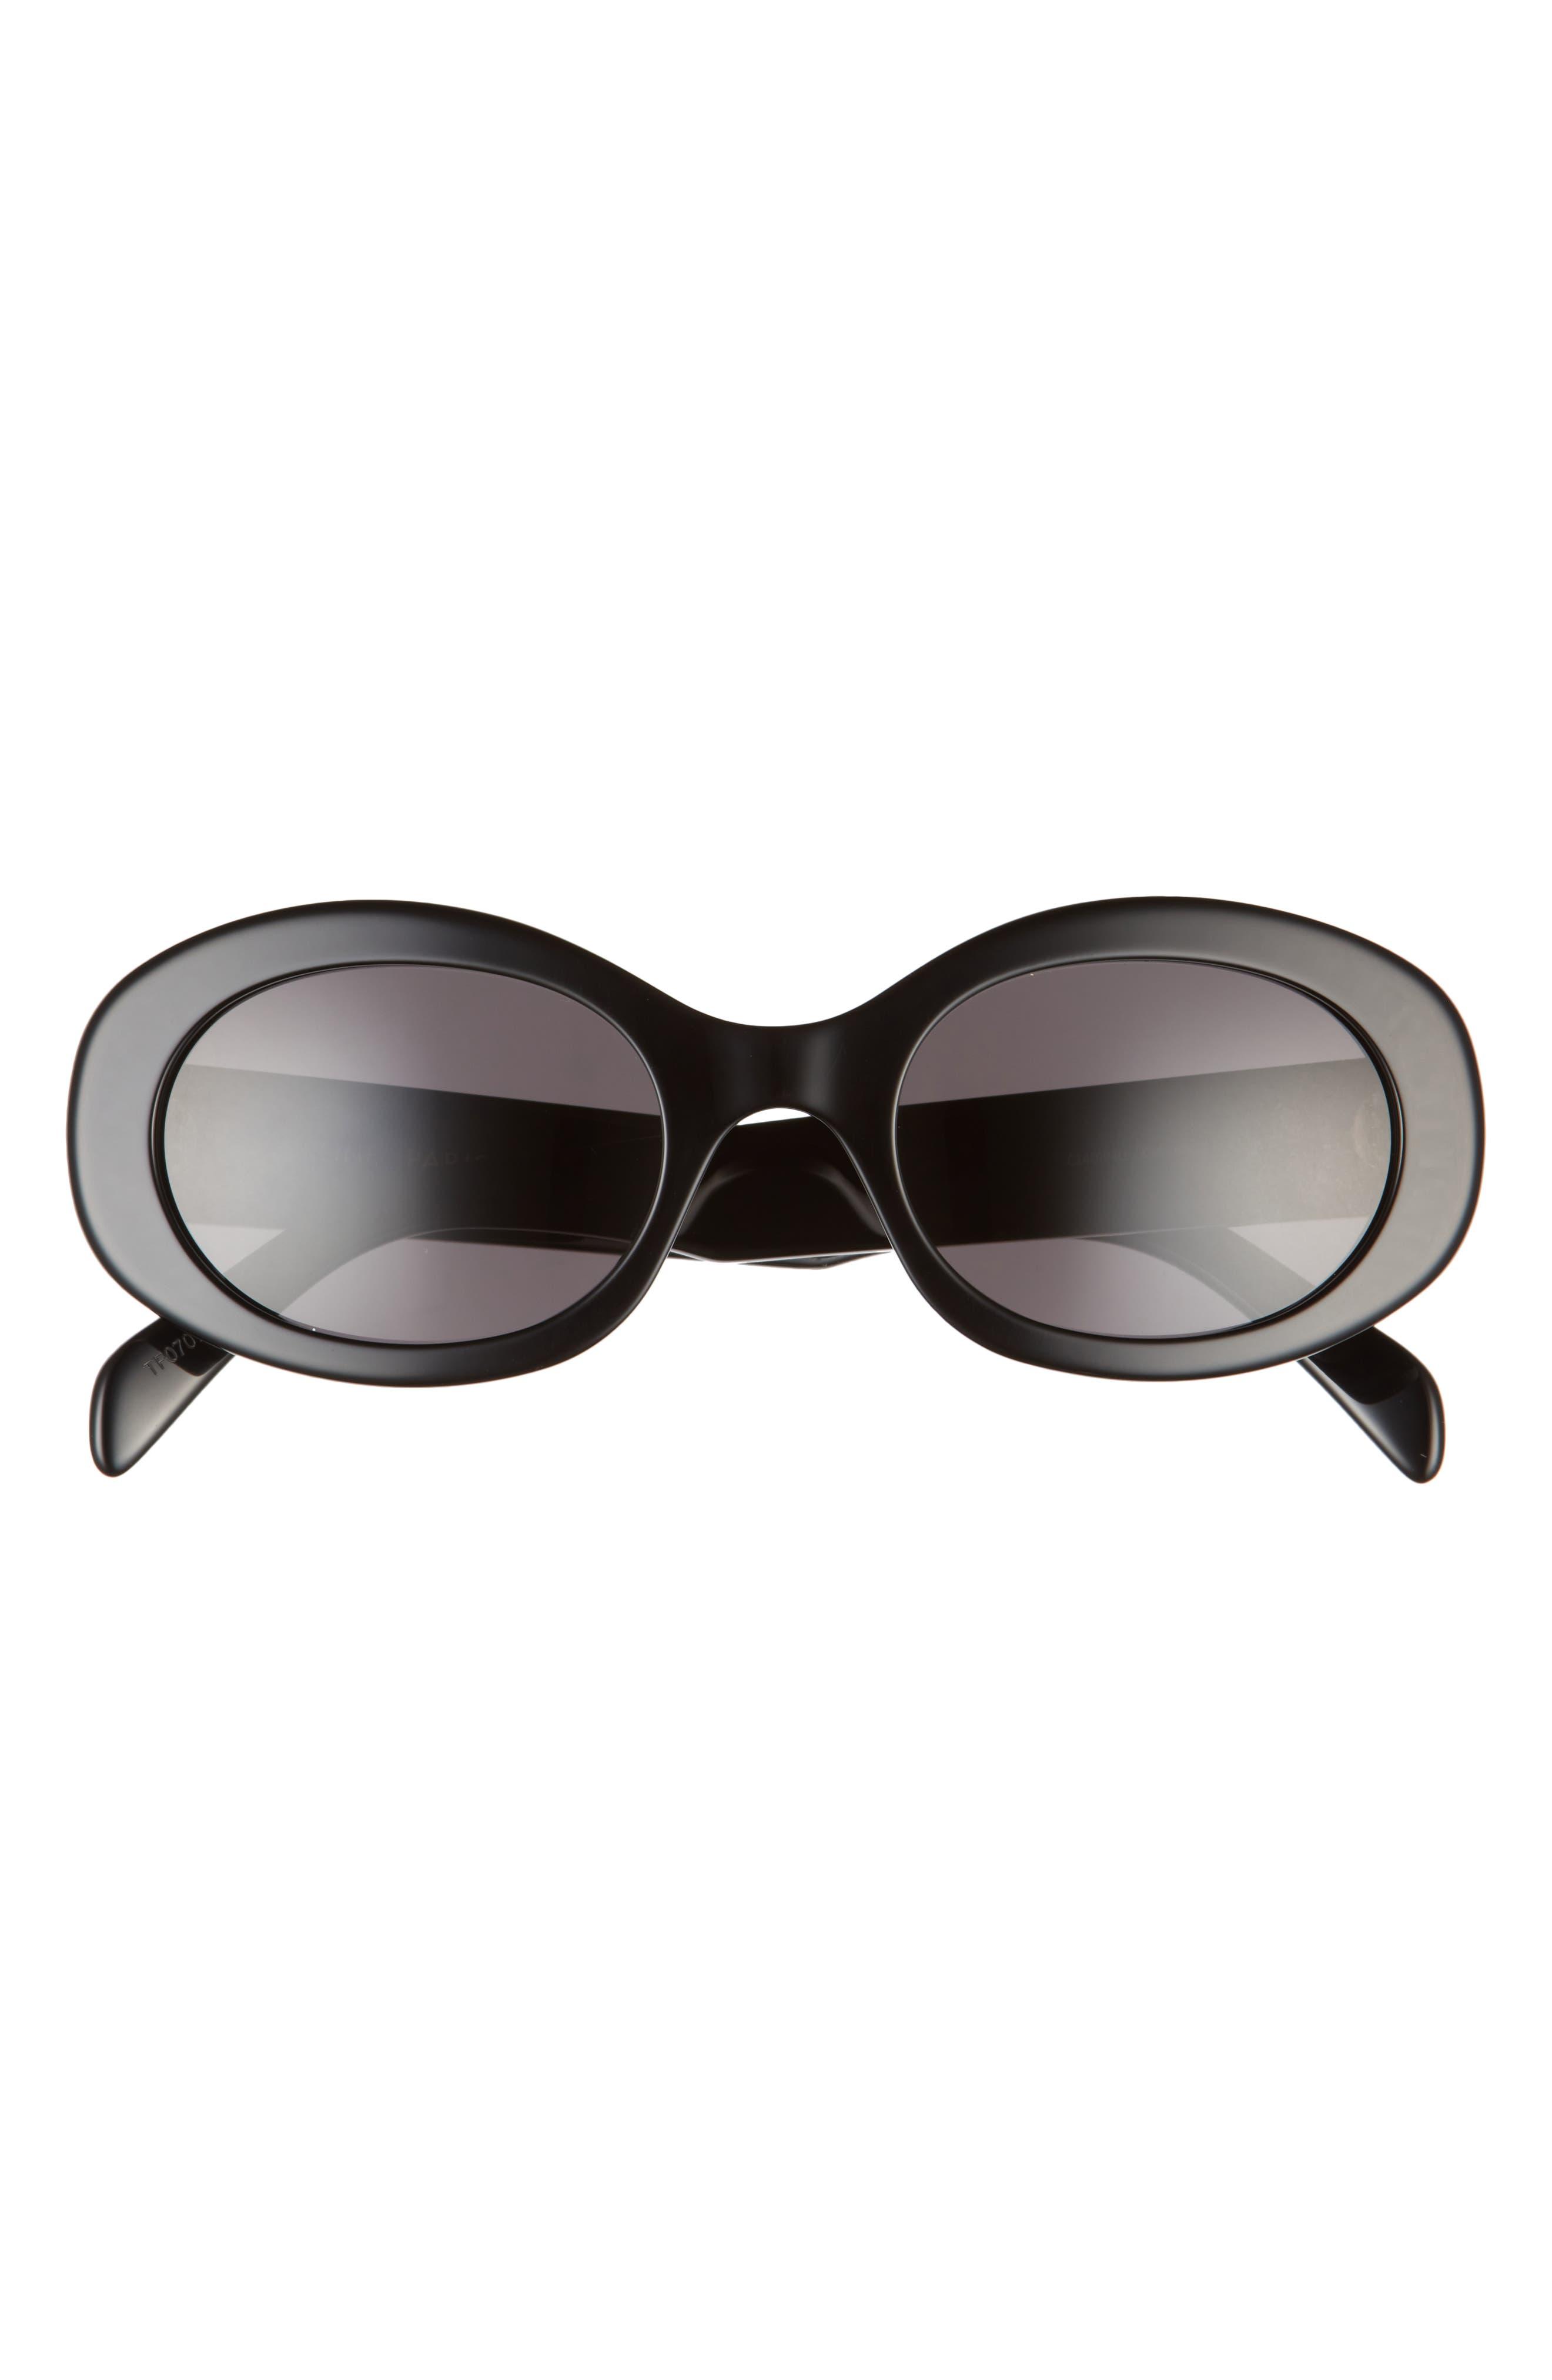 Triomphe 54mm Oval Sunglasses